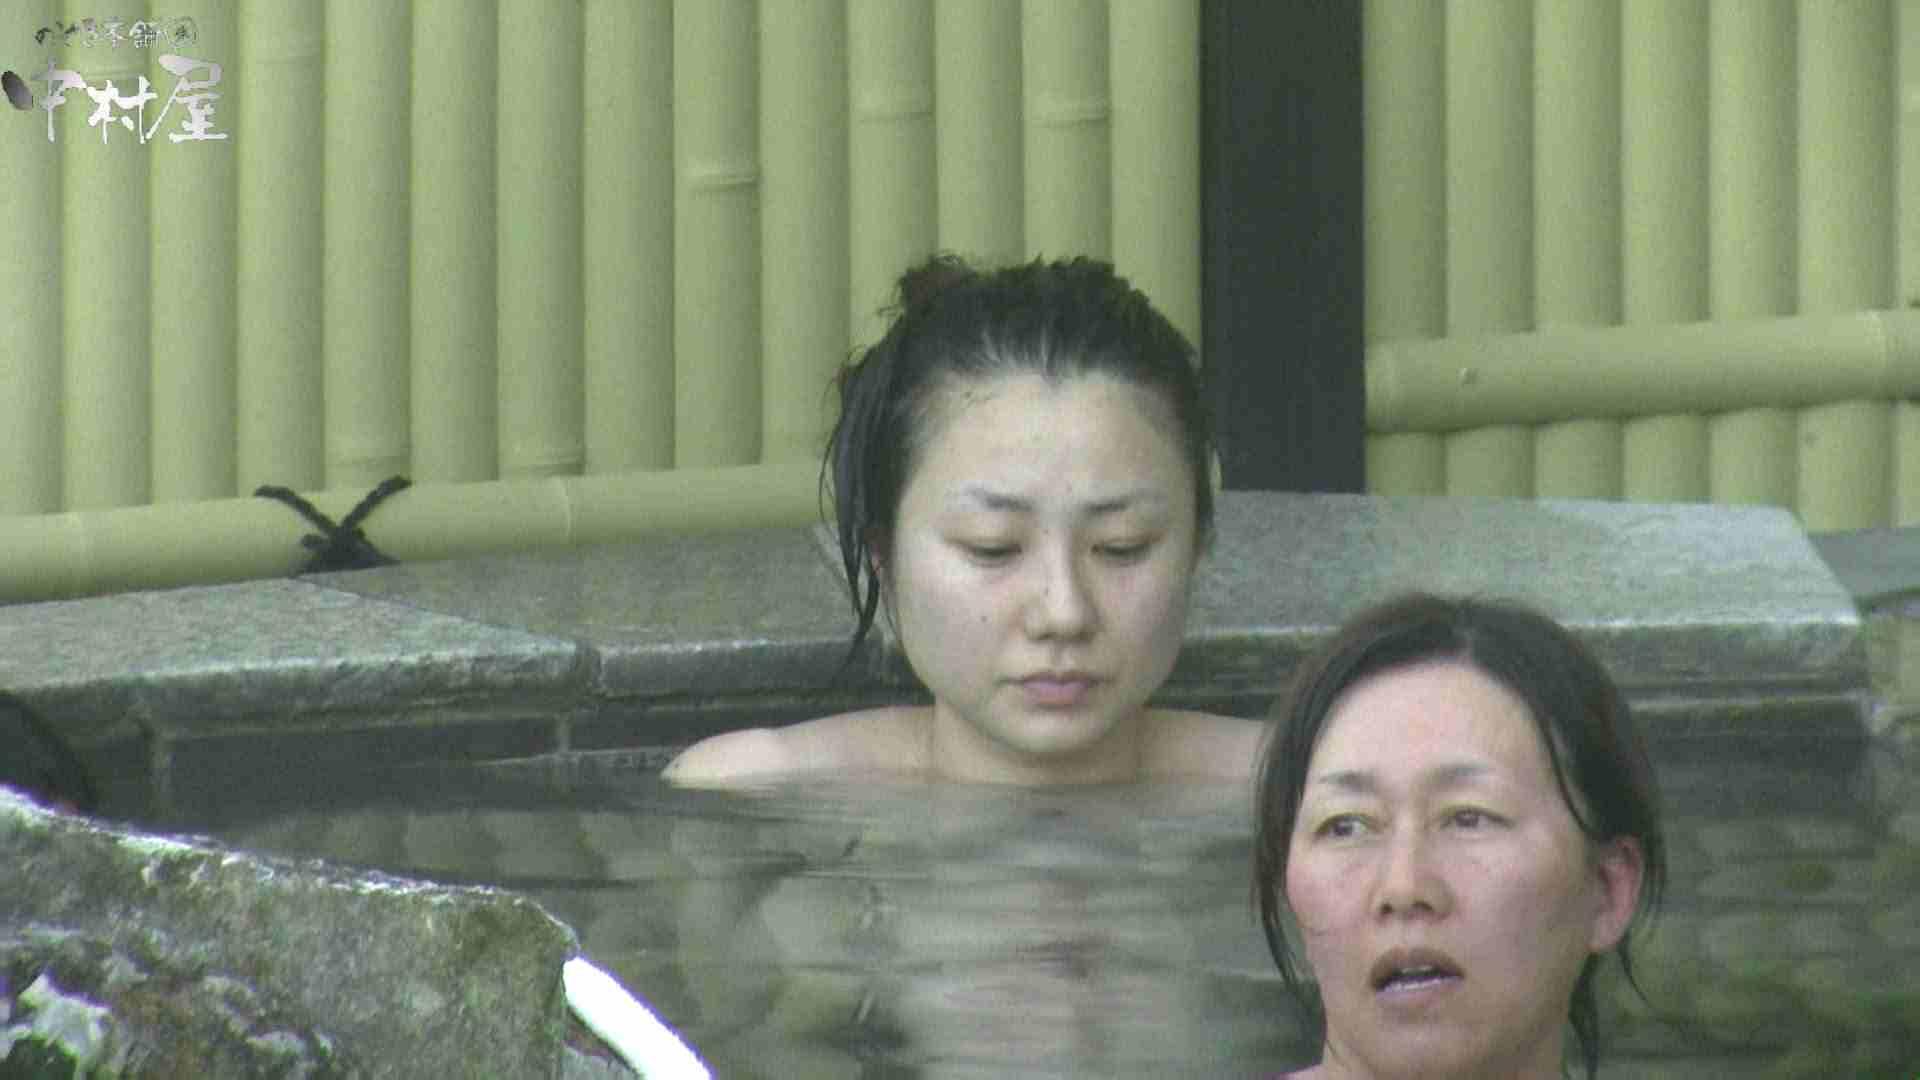 Aquaな露天風呂Vol.969 露天風呂編 | 盗撮シリーズ  113PIX 1